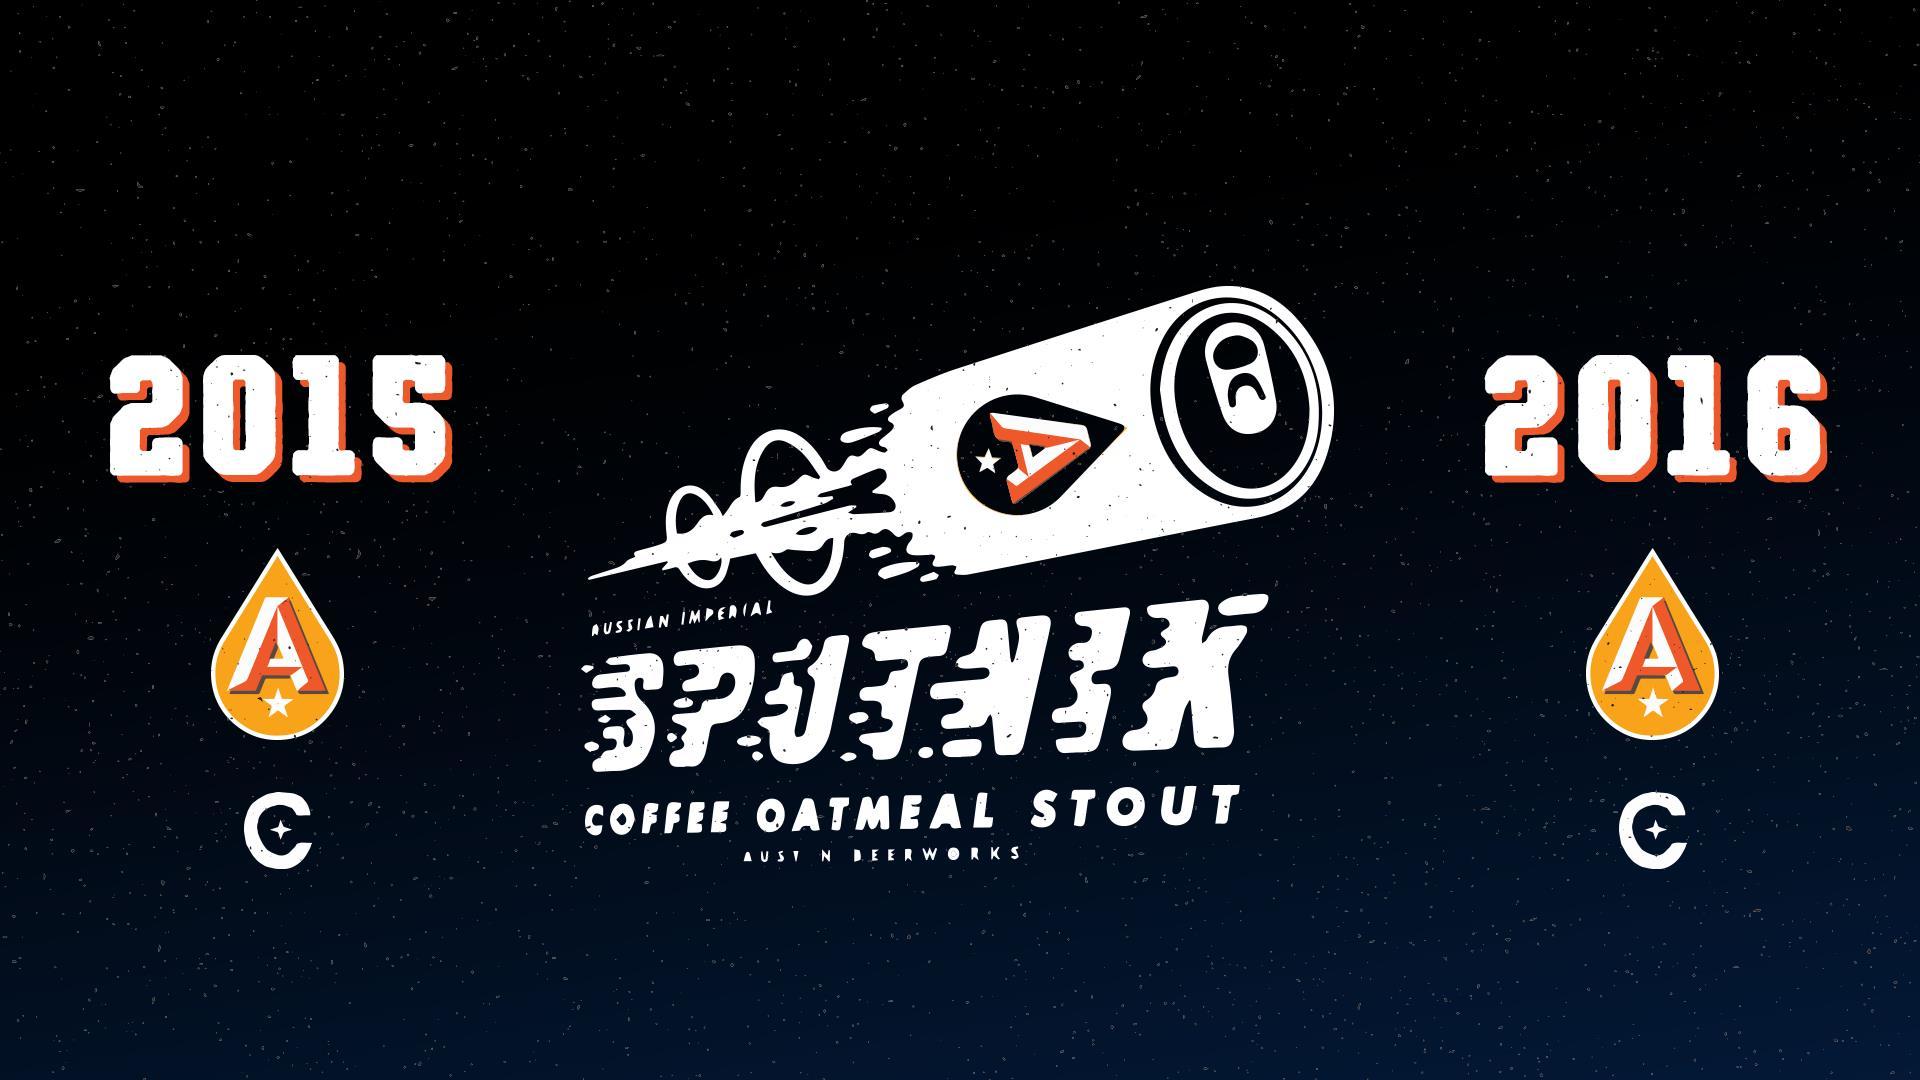 sputnik Austin Craft Beer Events Dec 12th to 18th 2016